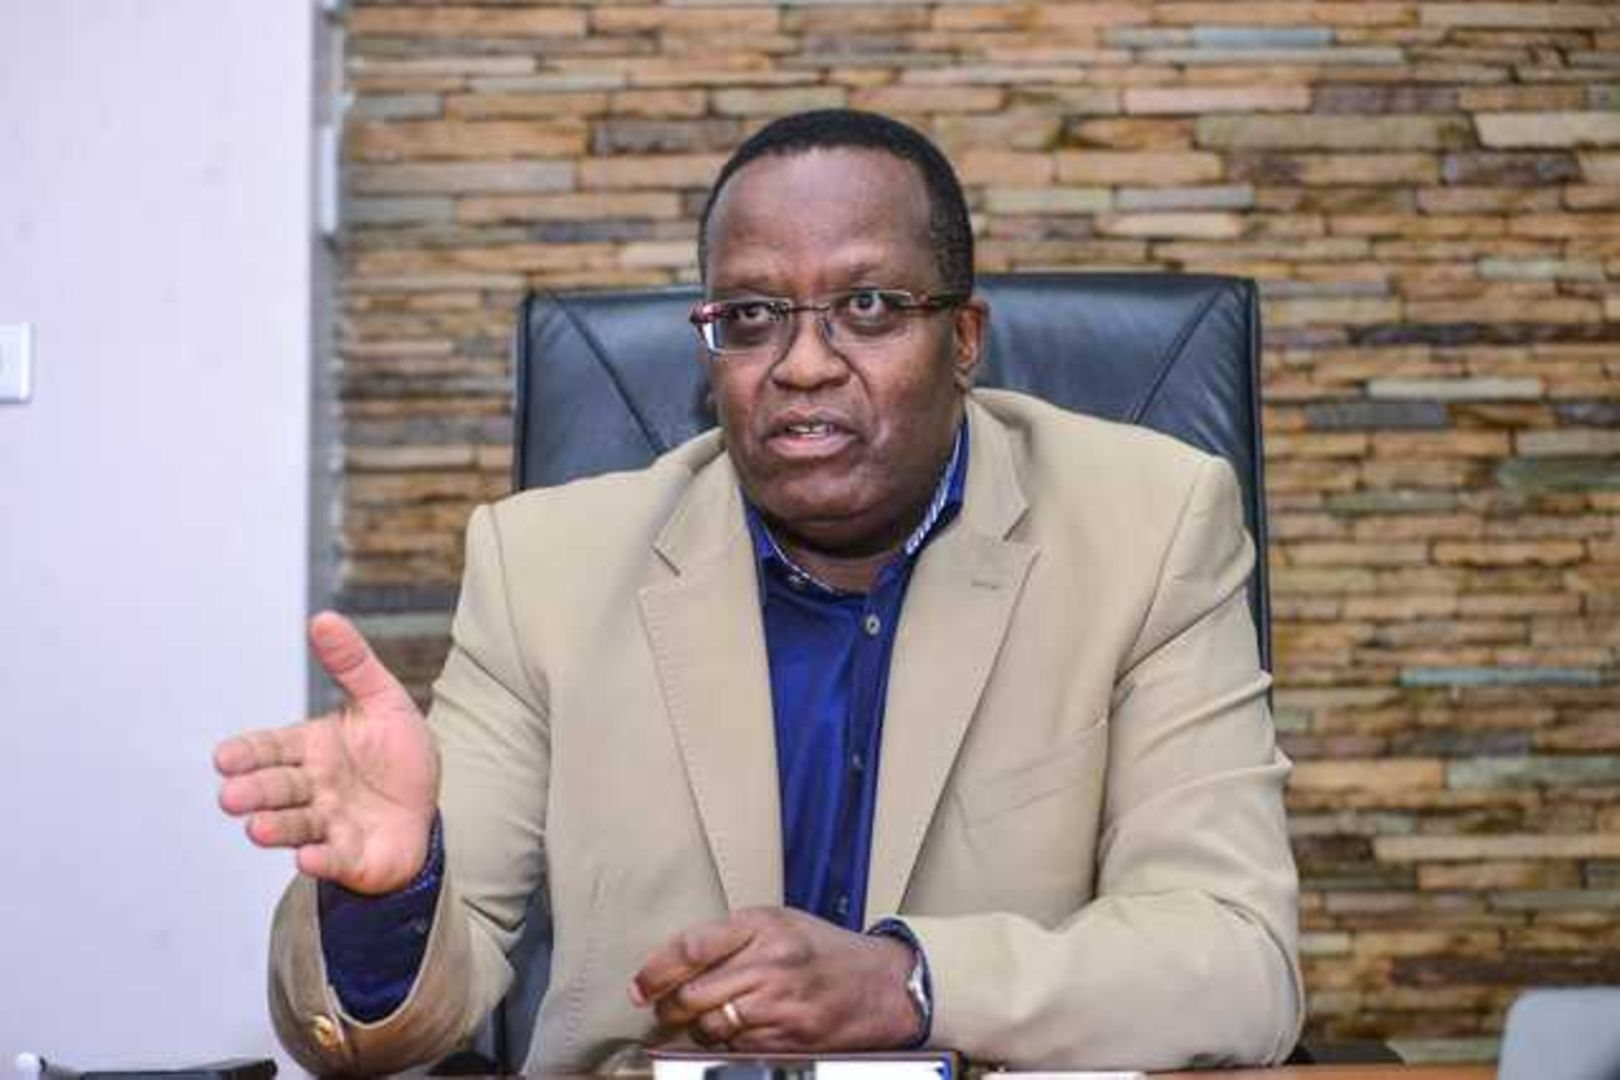 Managing Director Bernard Ngugi